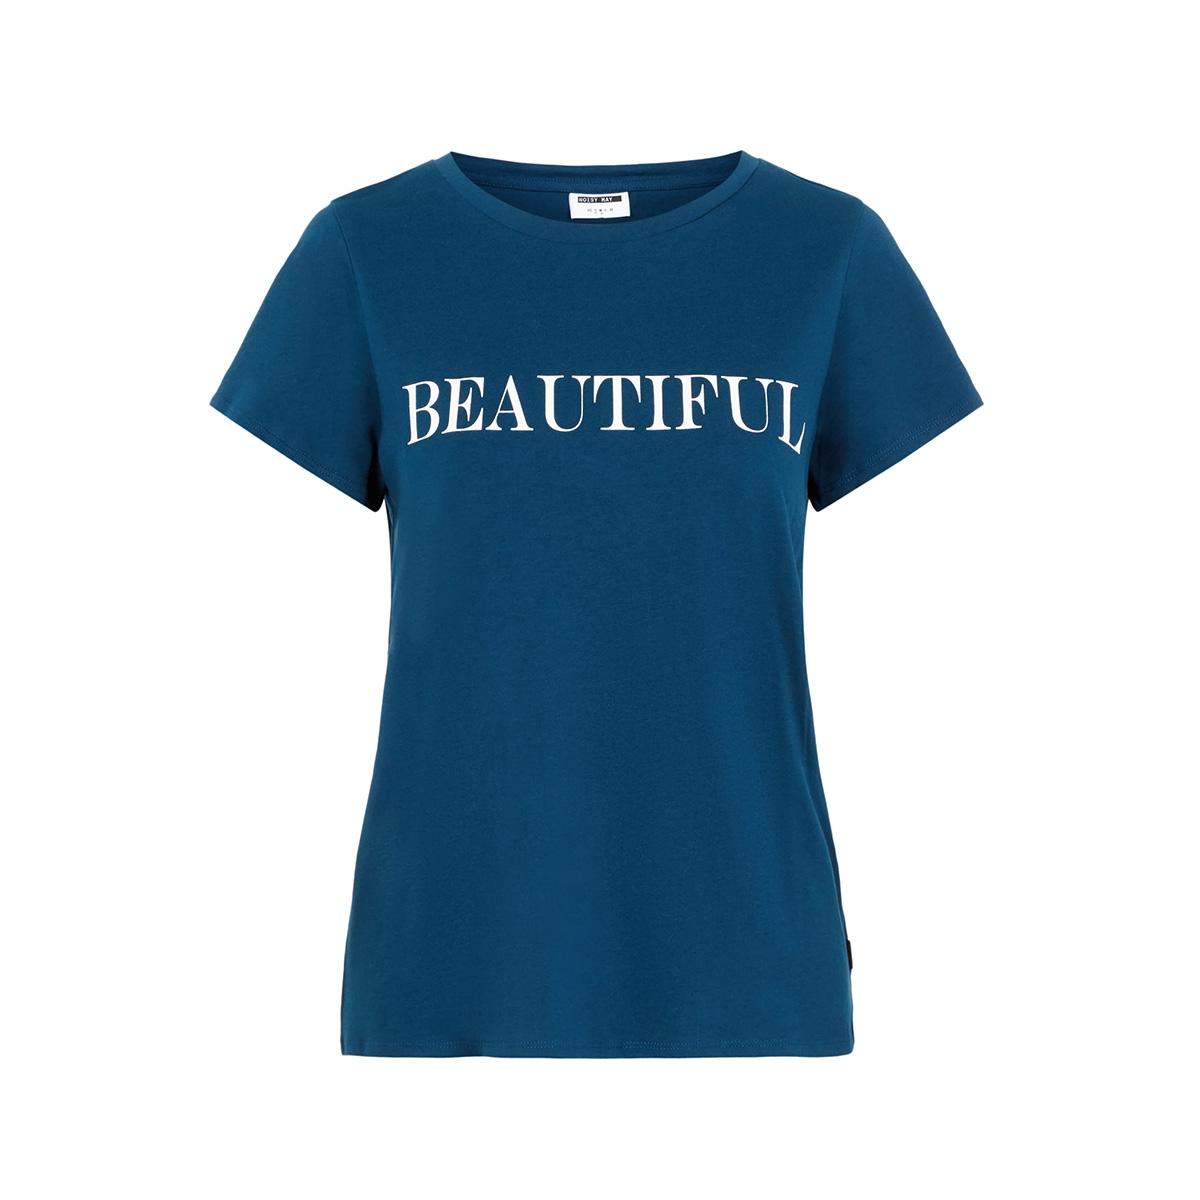 nmnate unis ss top bg 27008047 noisy may t-shirt gibraltar sea/beautiful